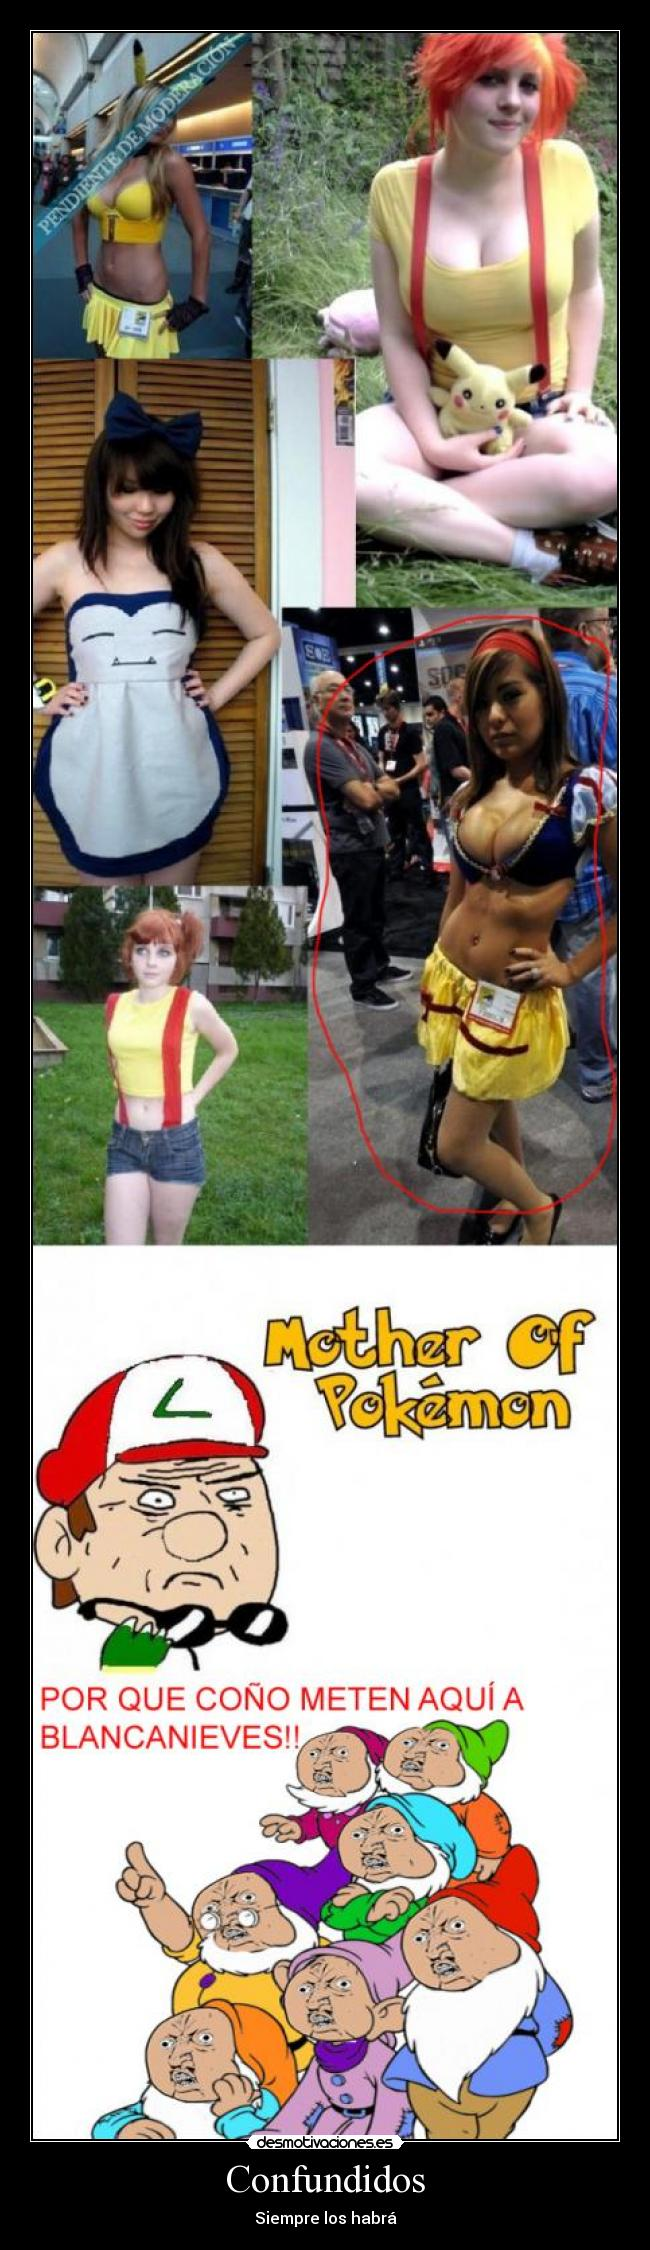 carteles enanos blancanieves pokemon cosplay pikachu misty desmotivaciones 82d445ff891